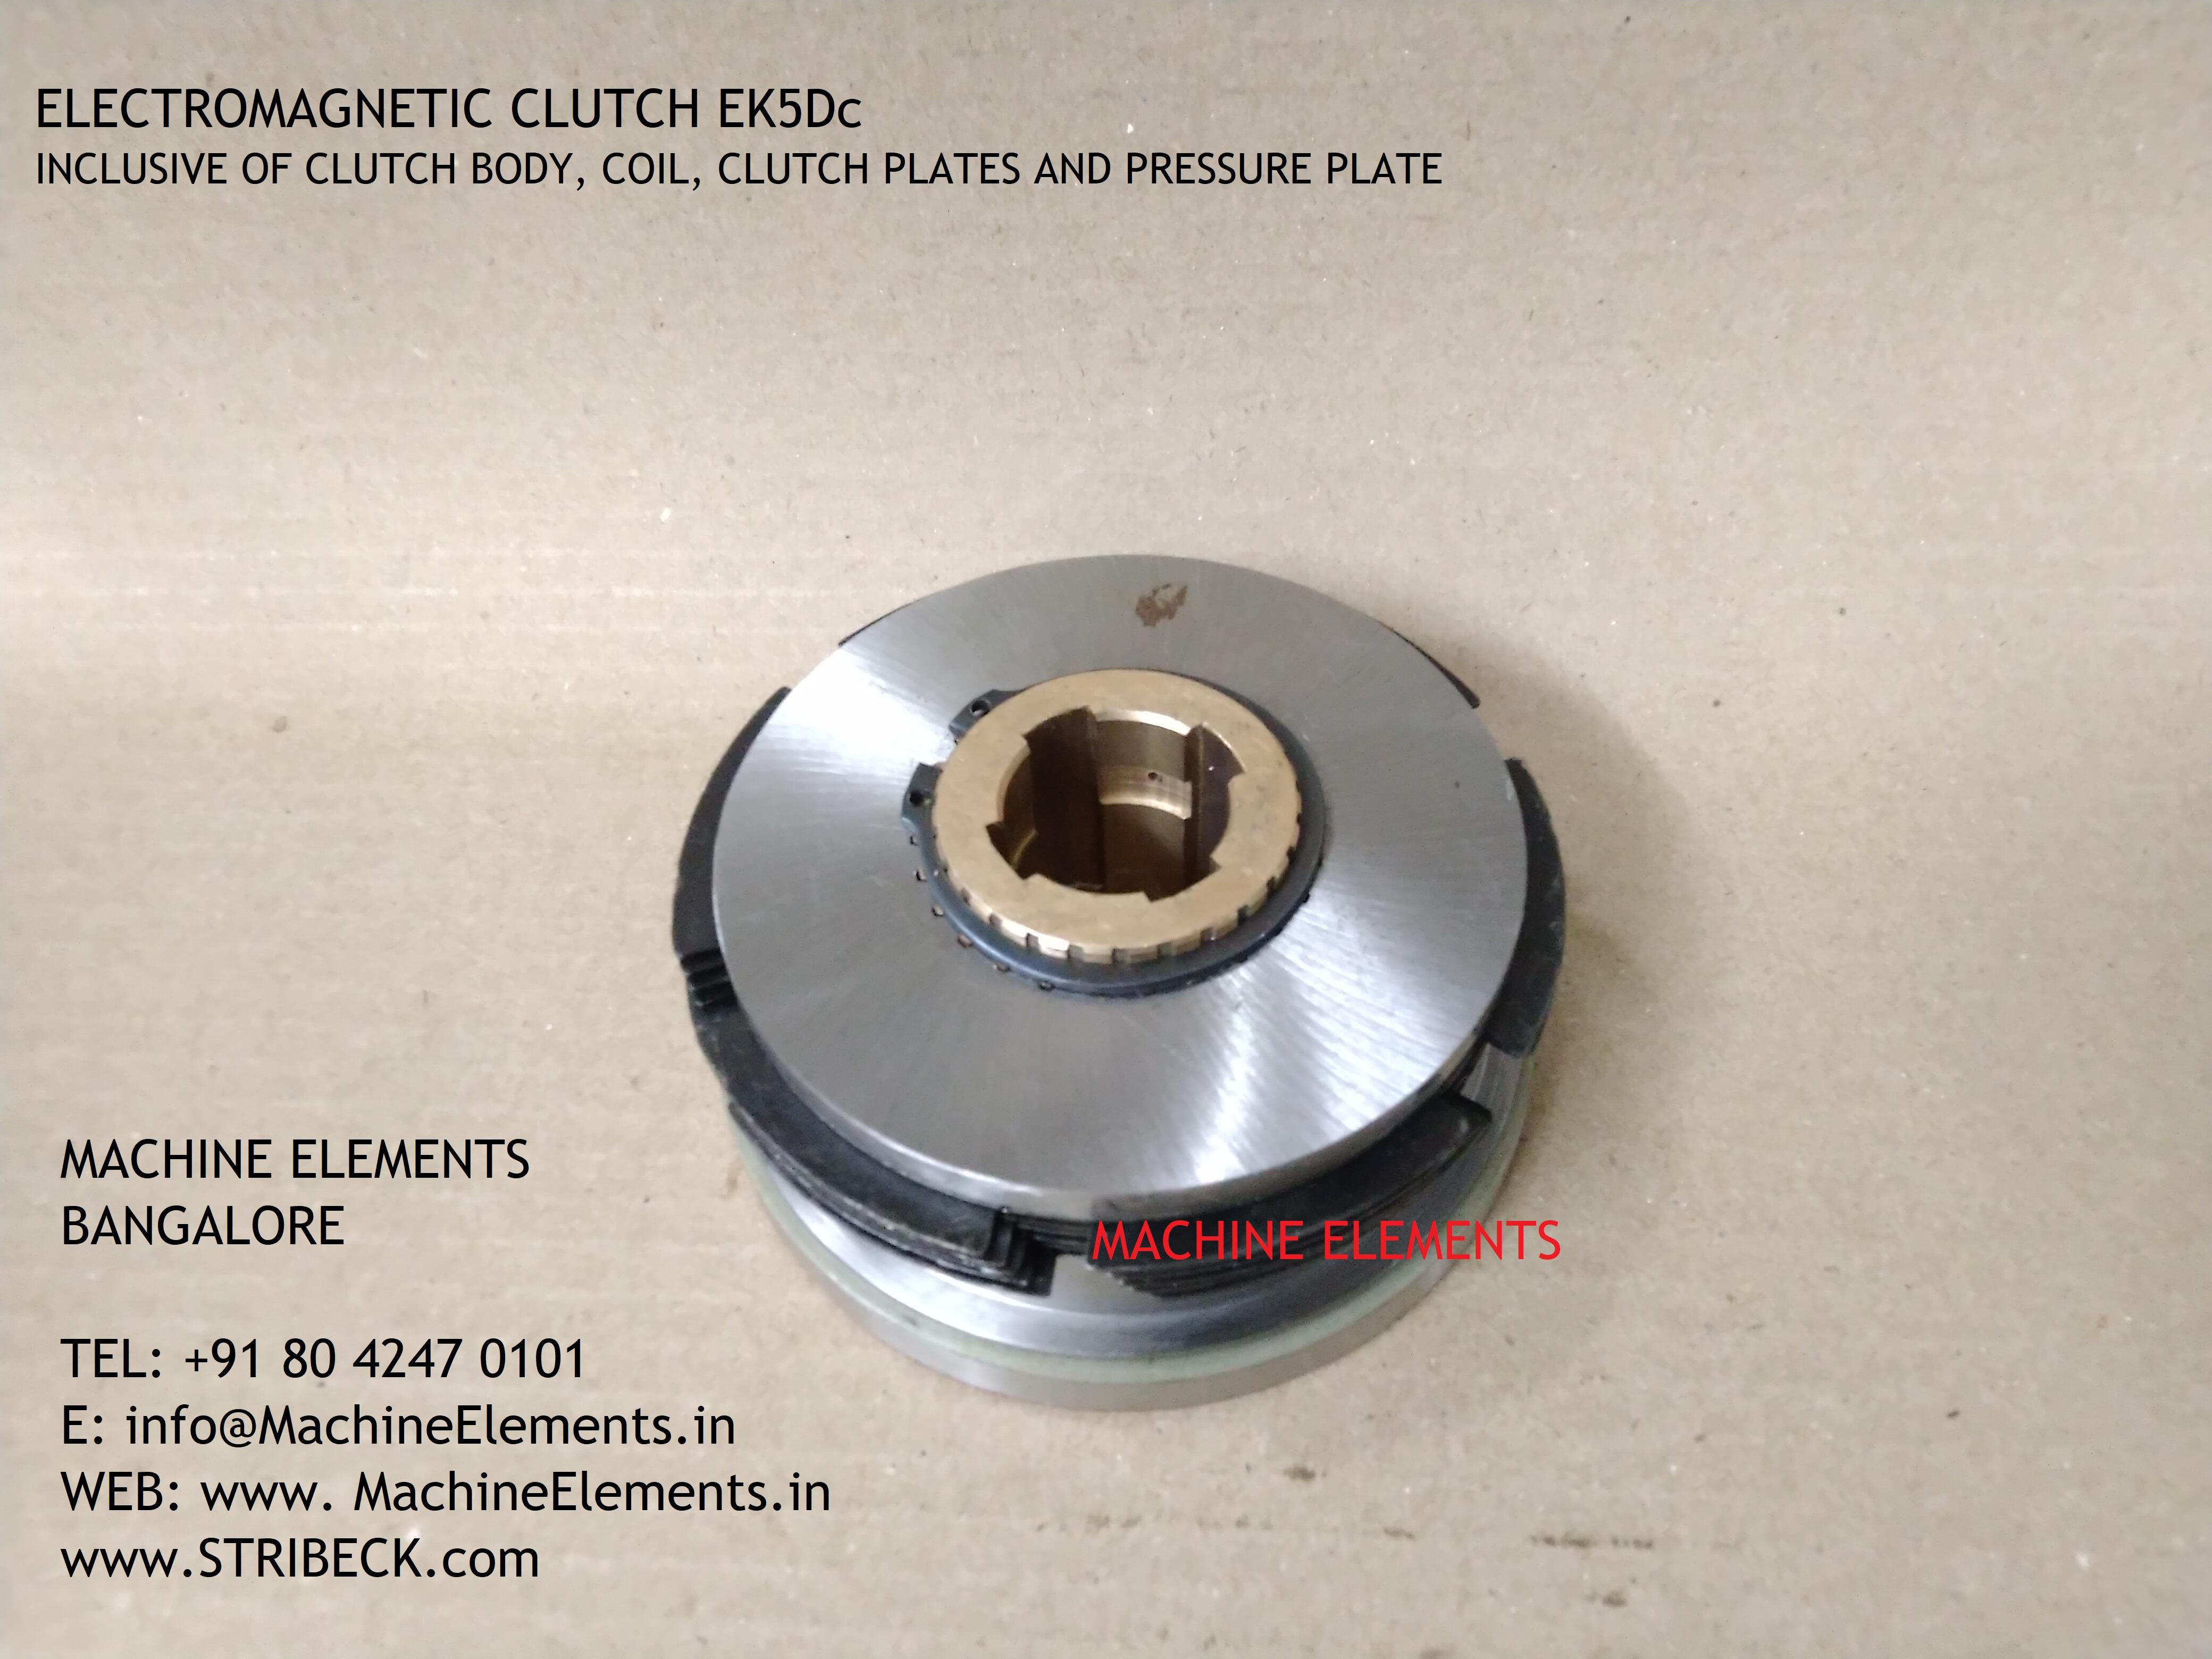 Electromagnetic Clutch EK5Dc